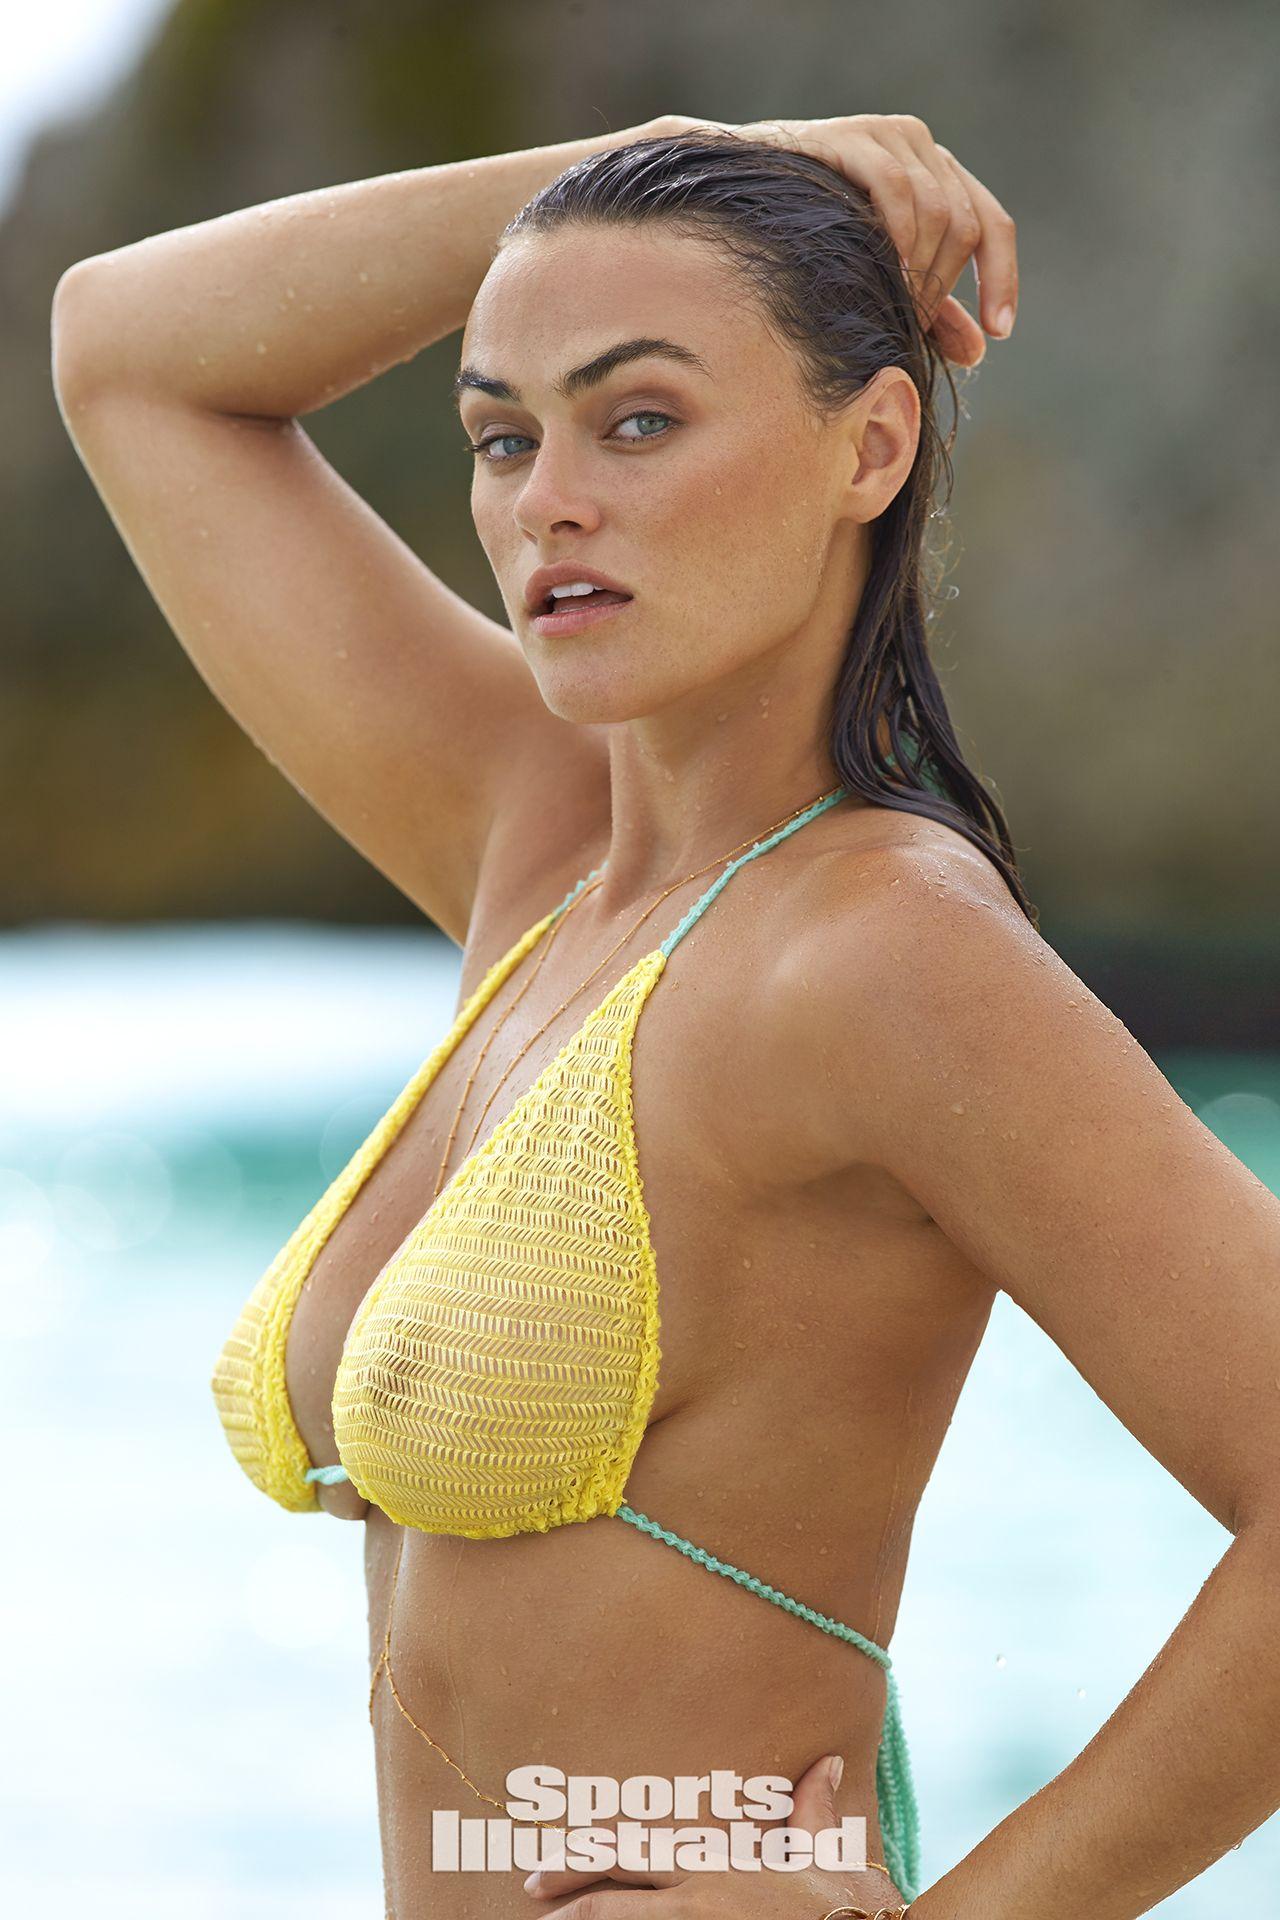 Myla Dalbesio Nude Photos 4